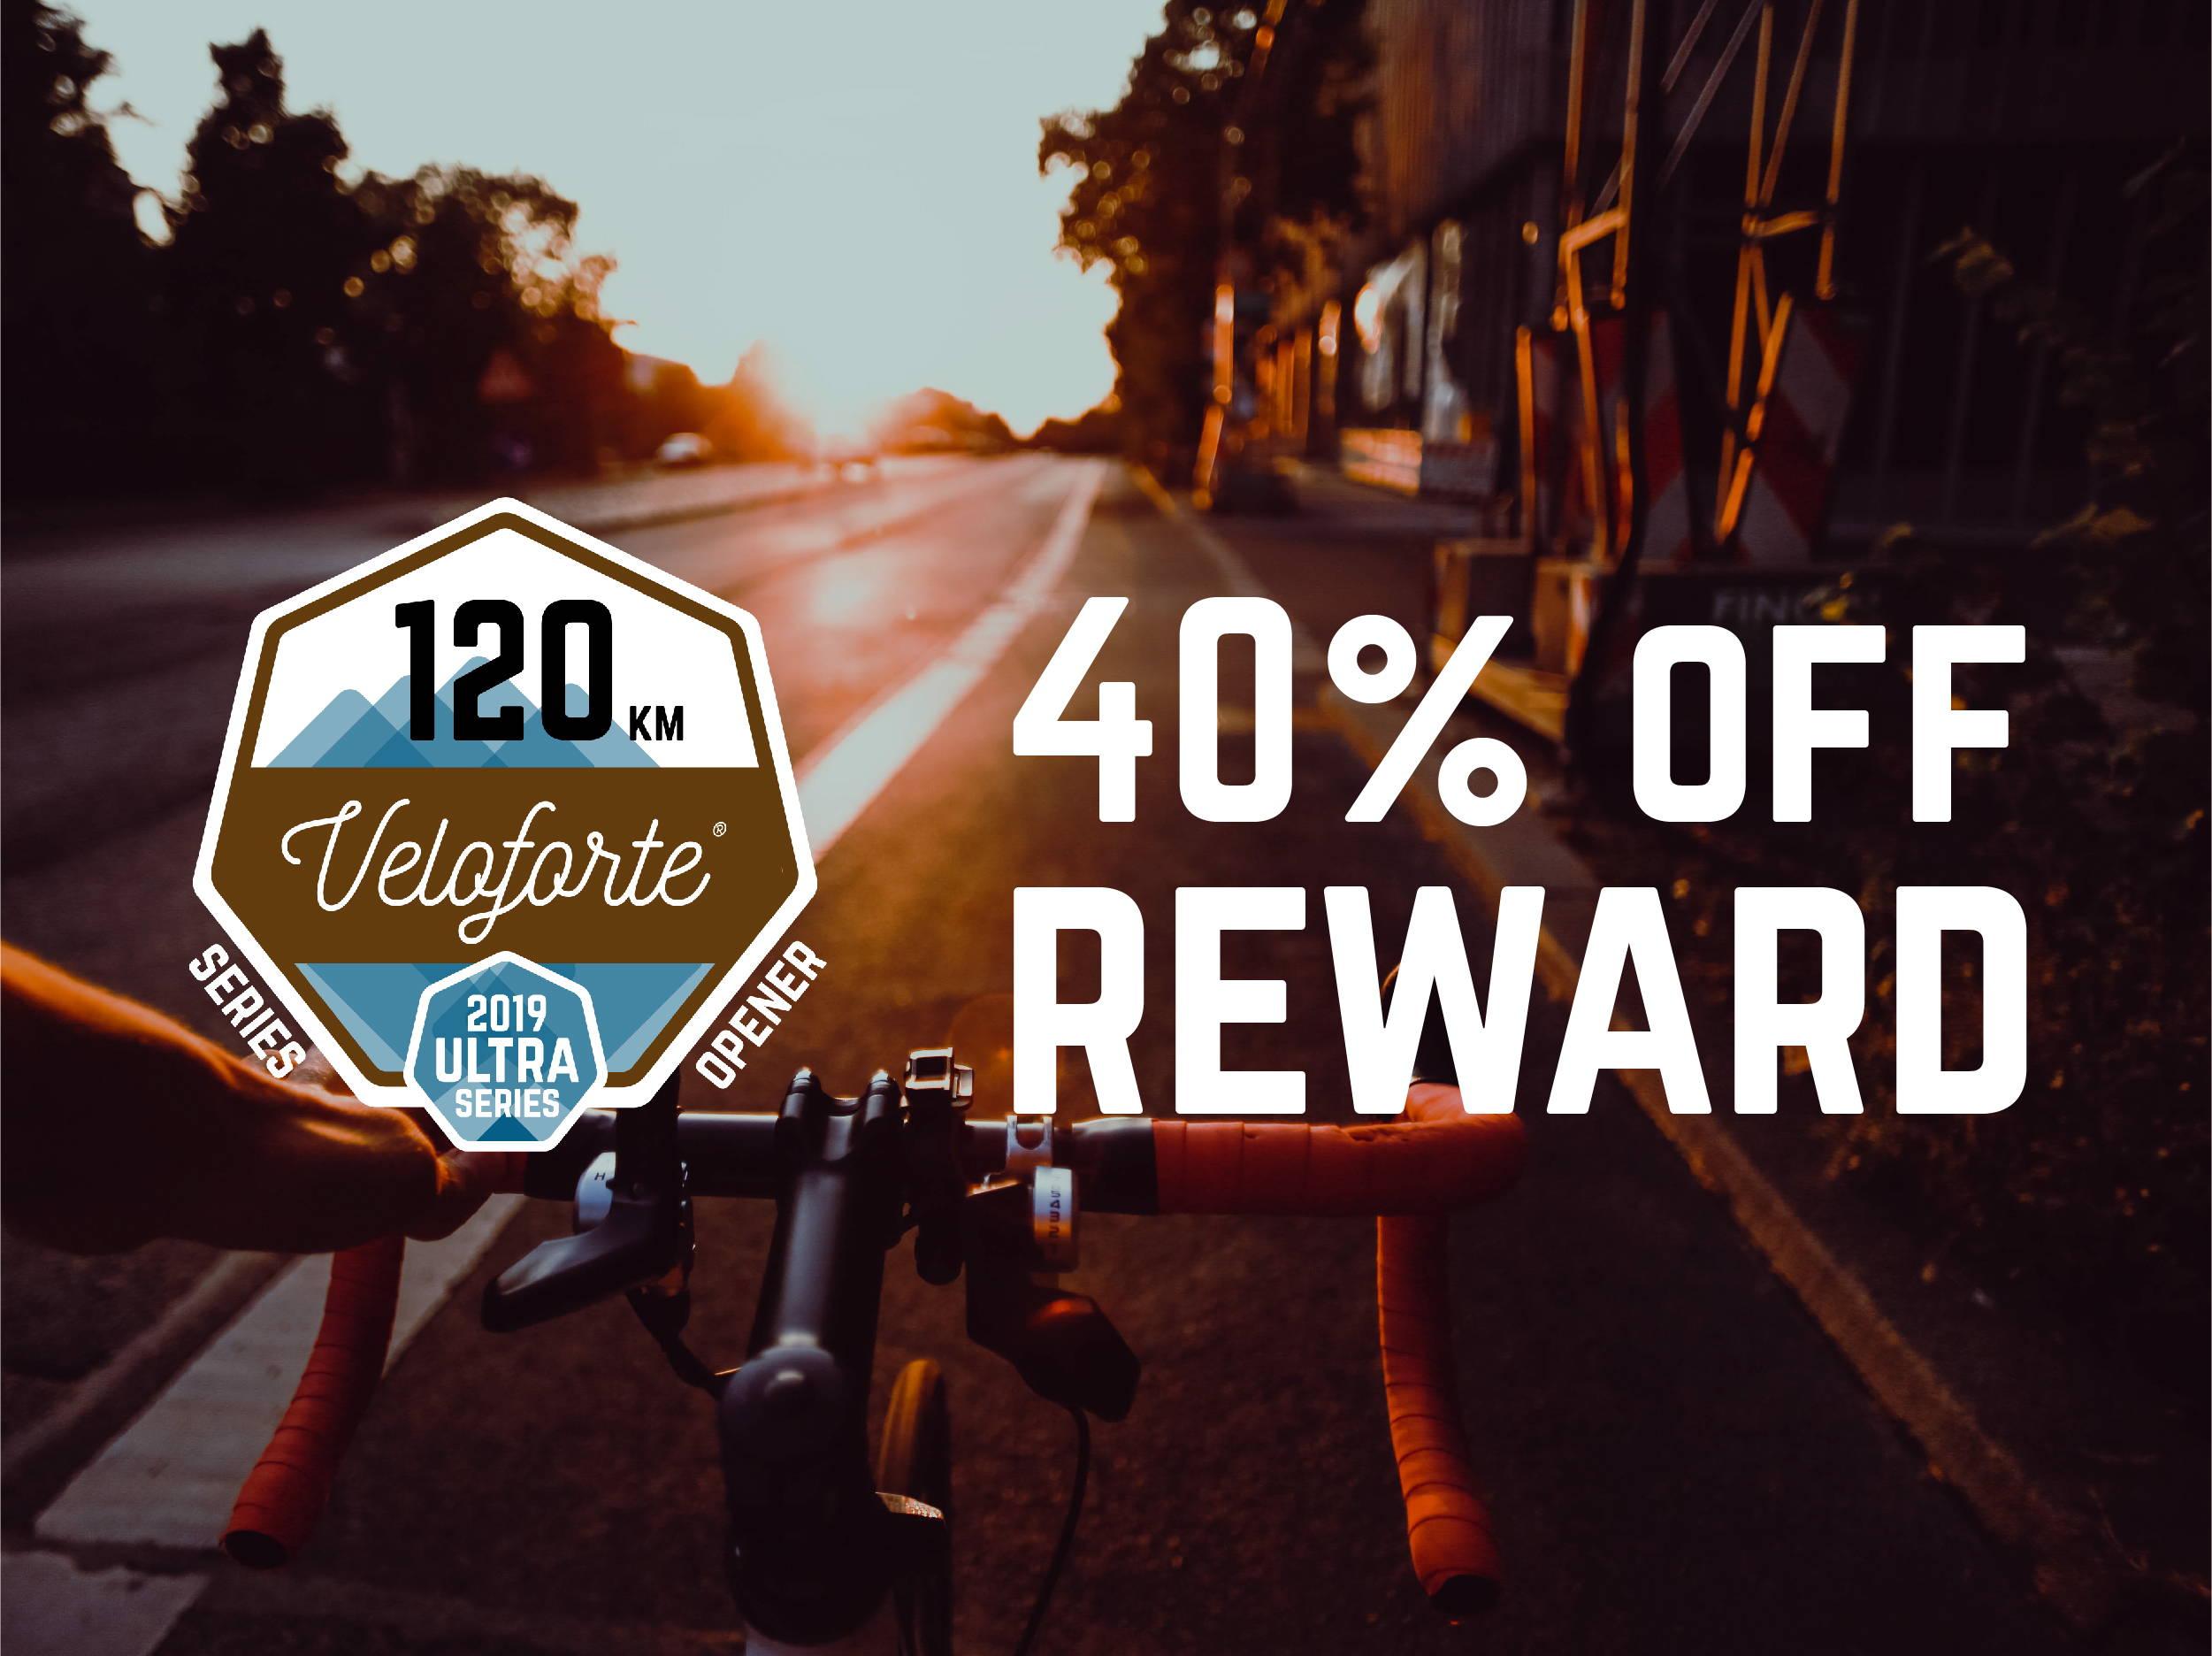 Veloforte | Strava Challenge Reward